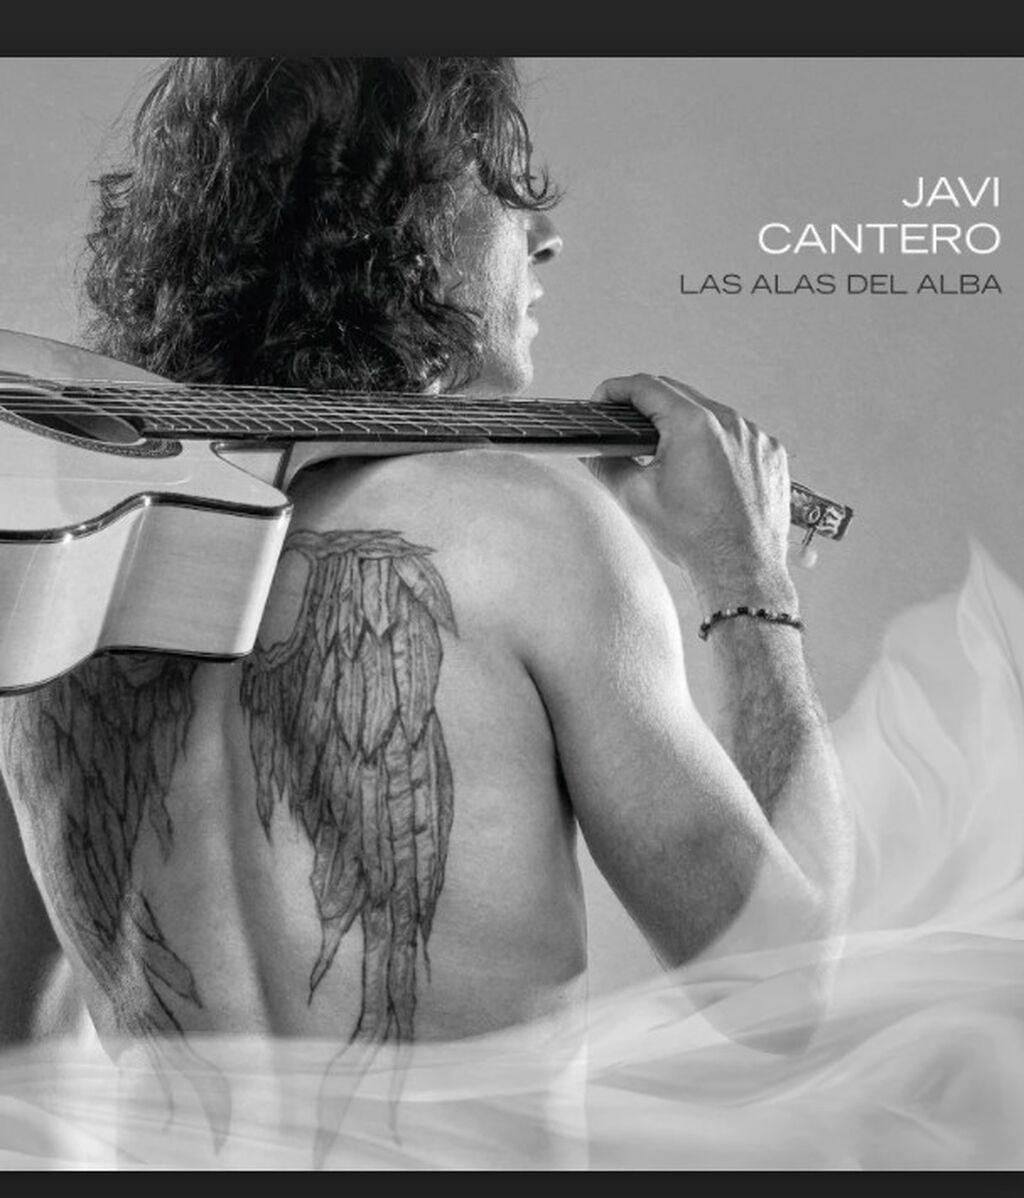 Javi Cantero, en la portada de Alas de Alba